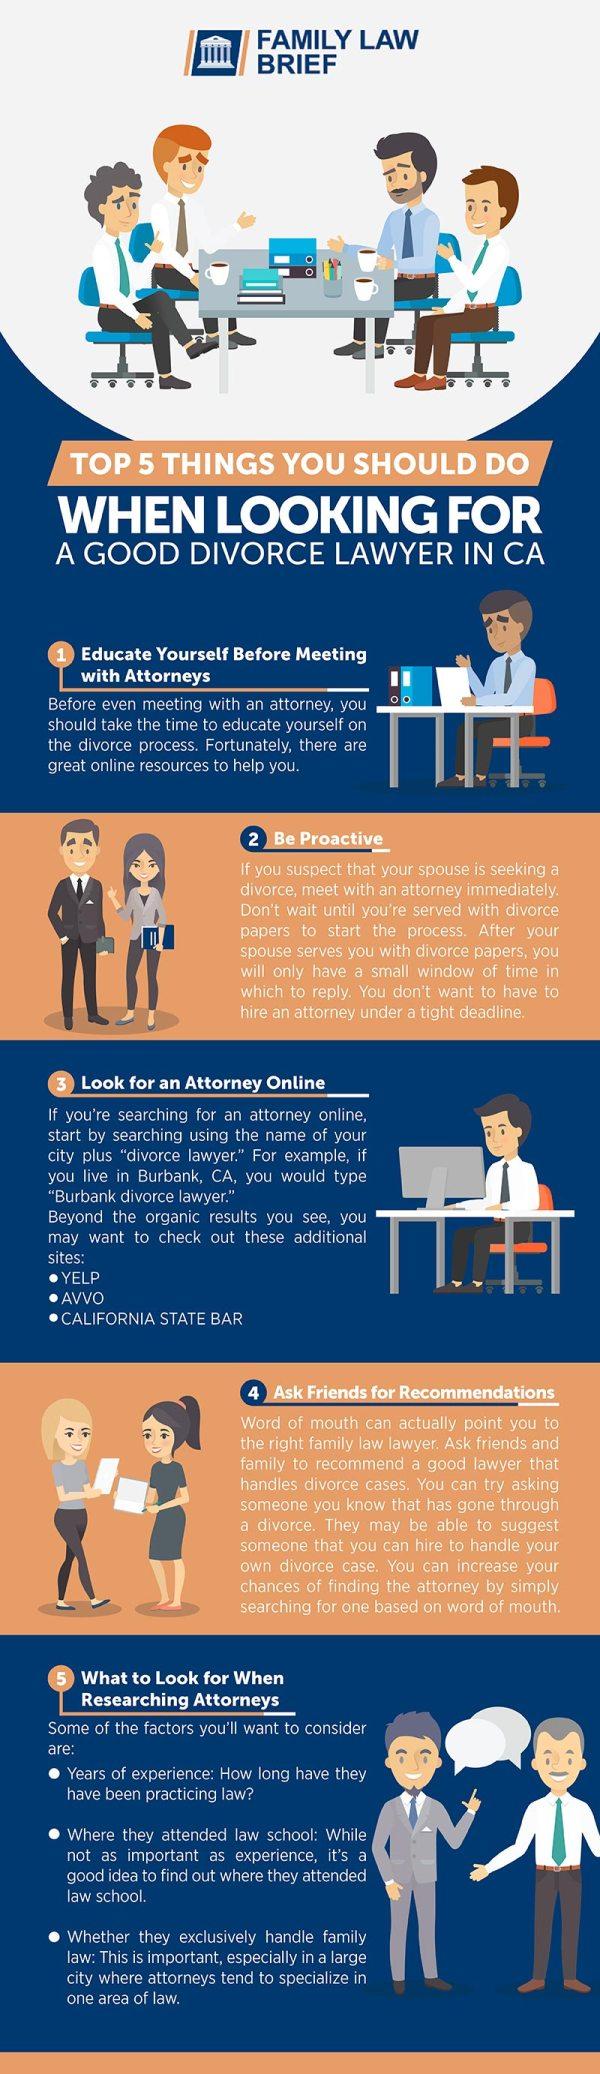 find-divorce-lawyer